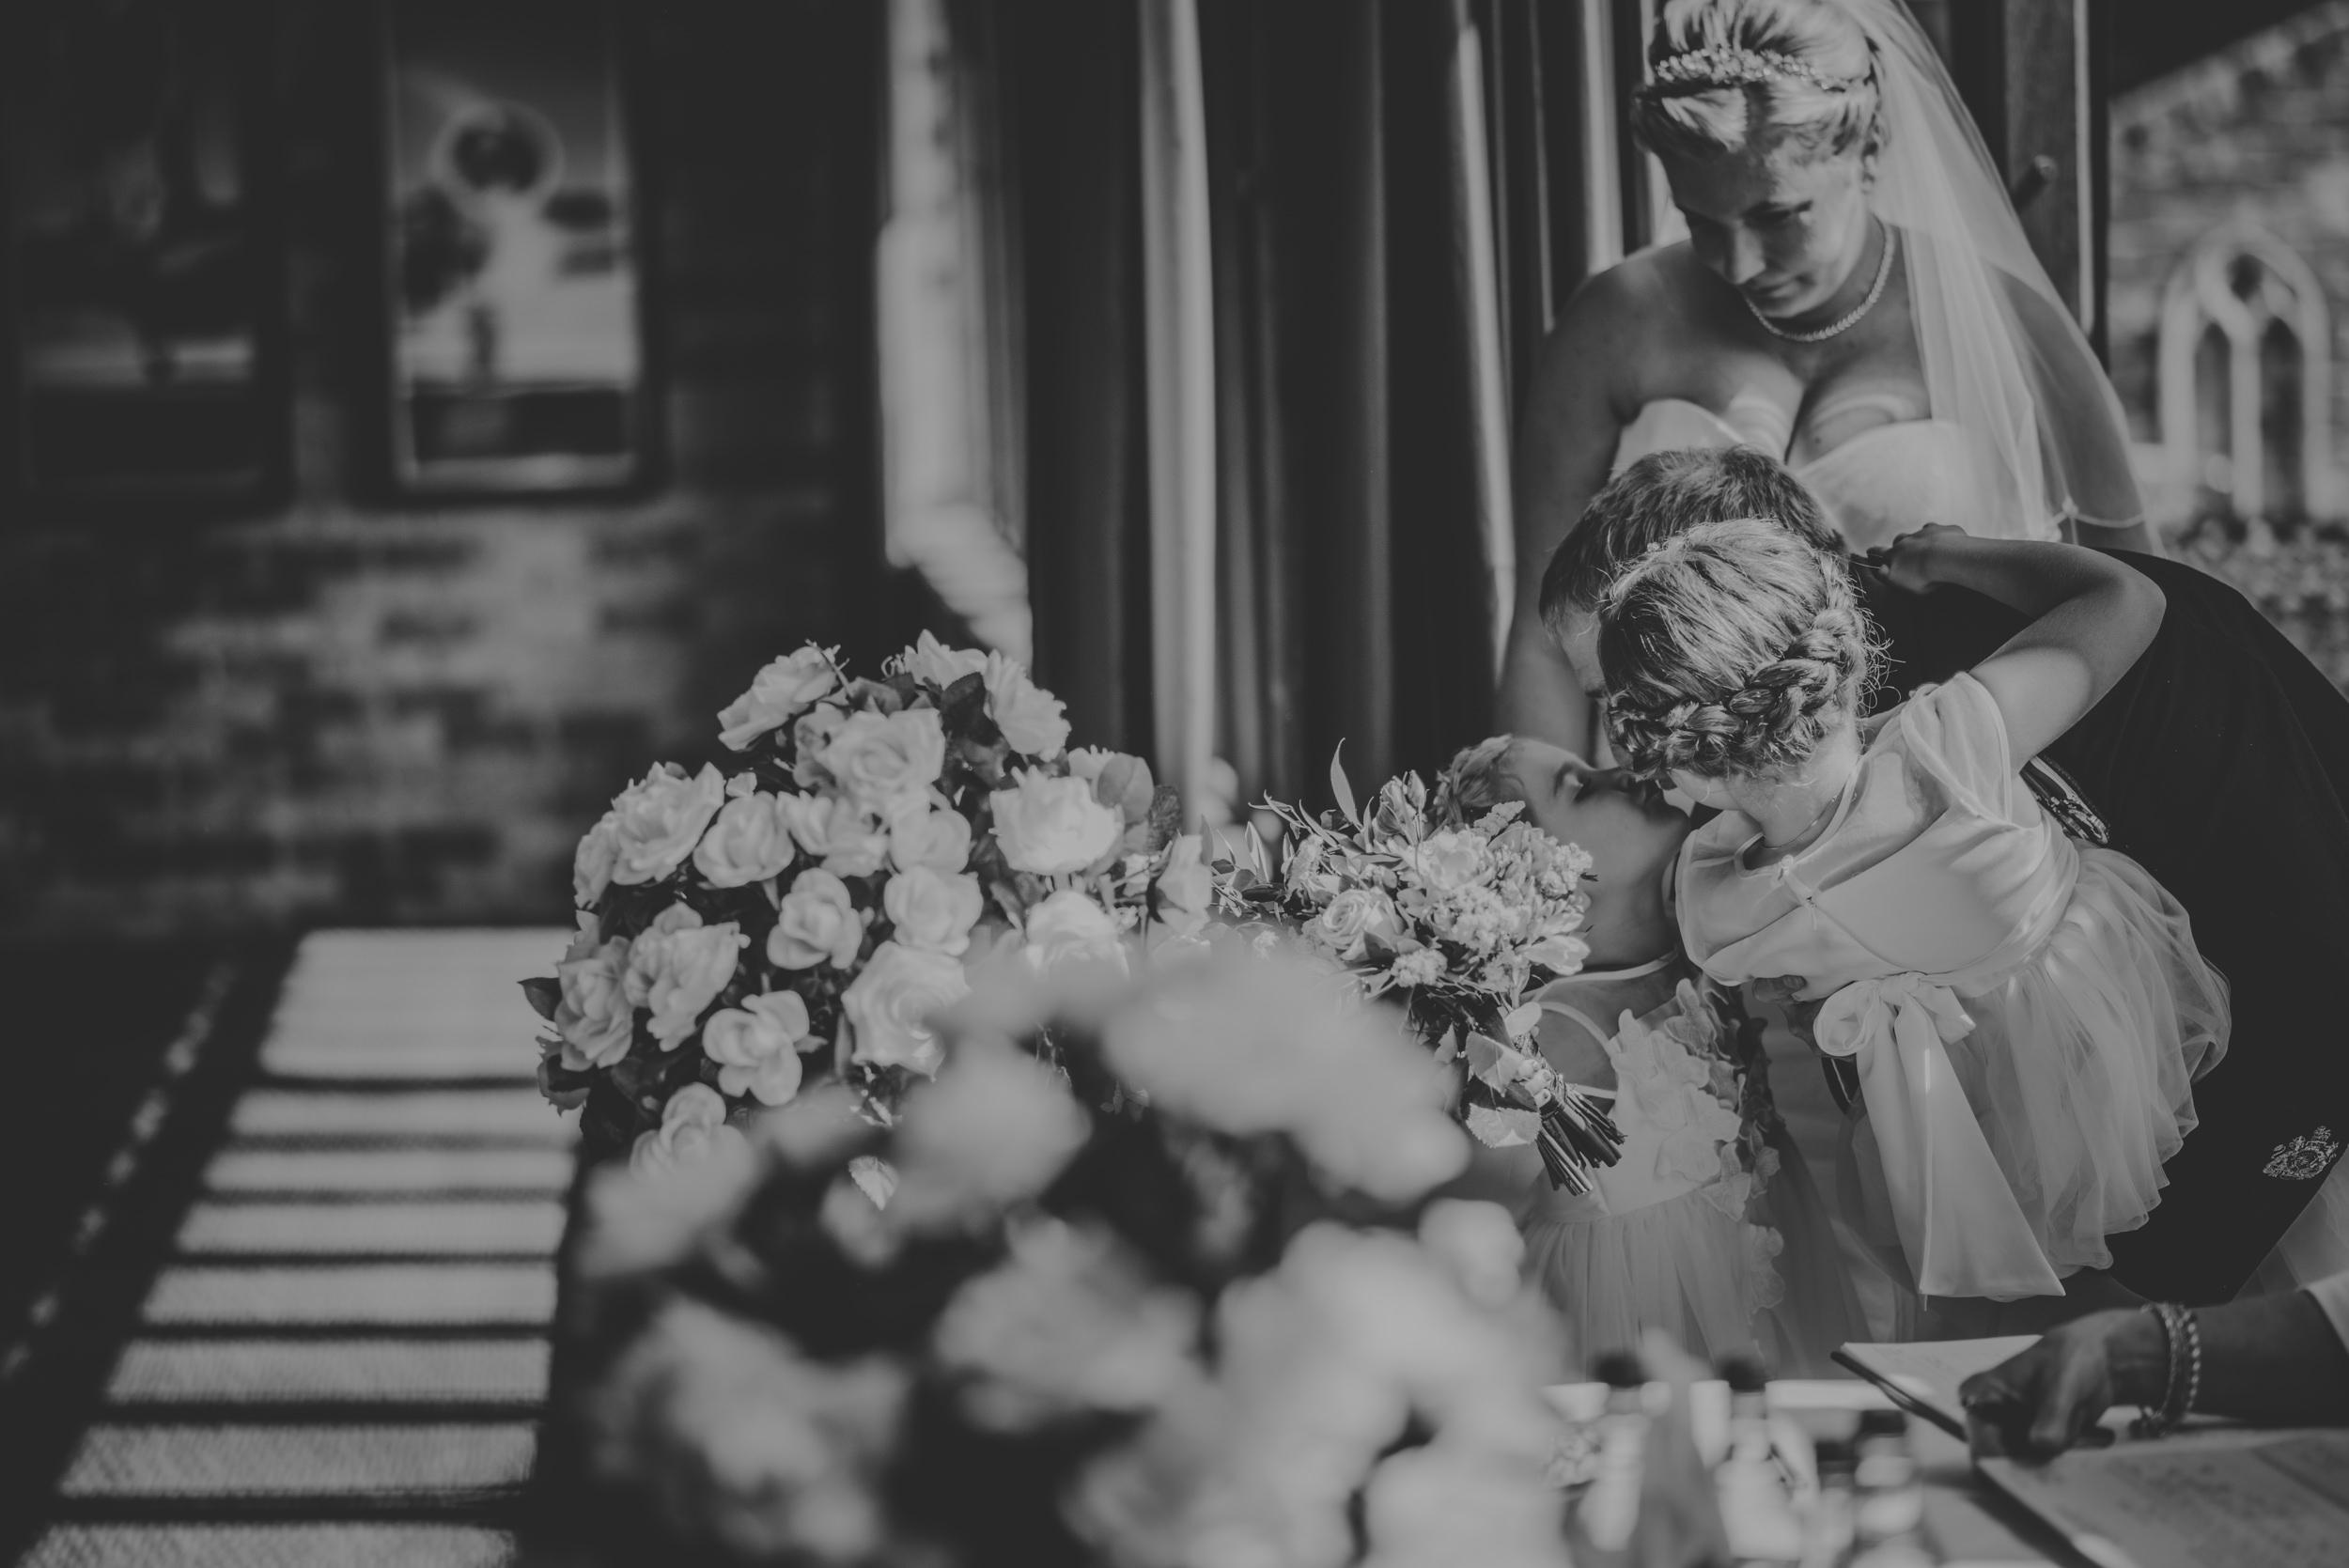 Chantelle-and-Stephen-Old-Thorns-Hotel-Wedding-Liphook-Manu-Mendoza-Wedding-Photography-239.jpg